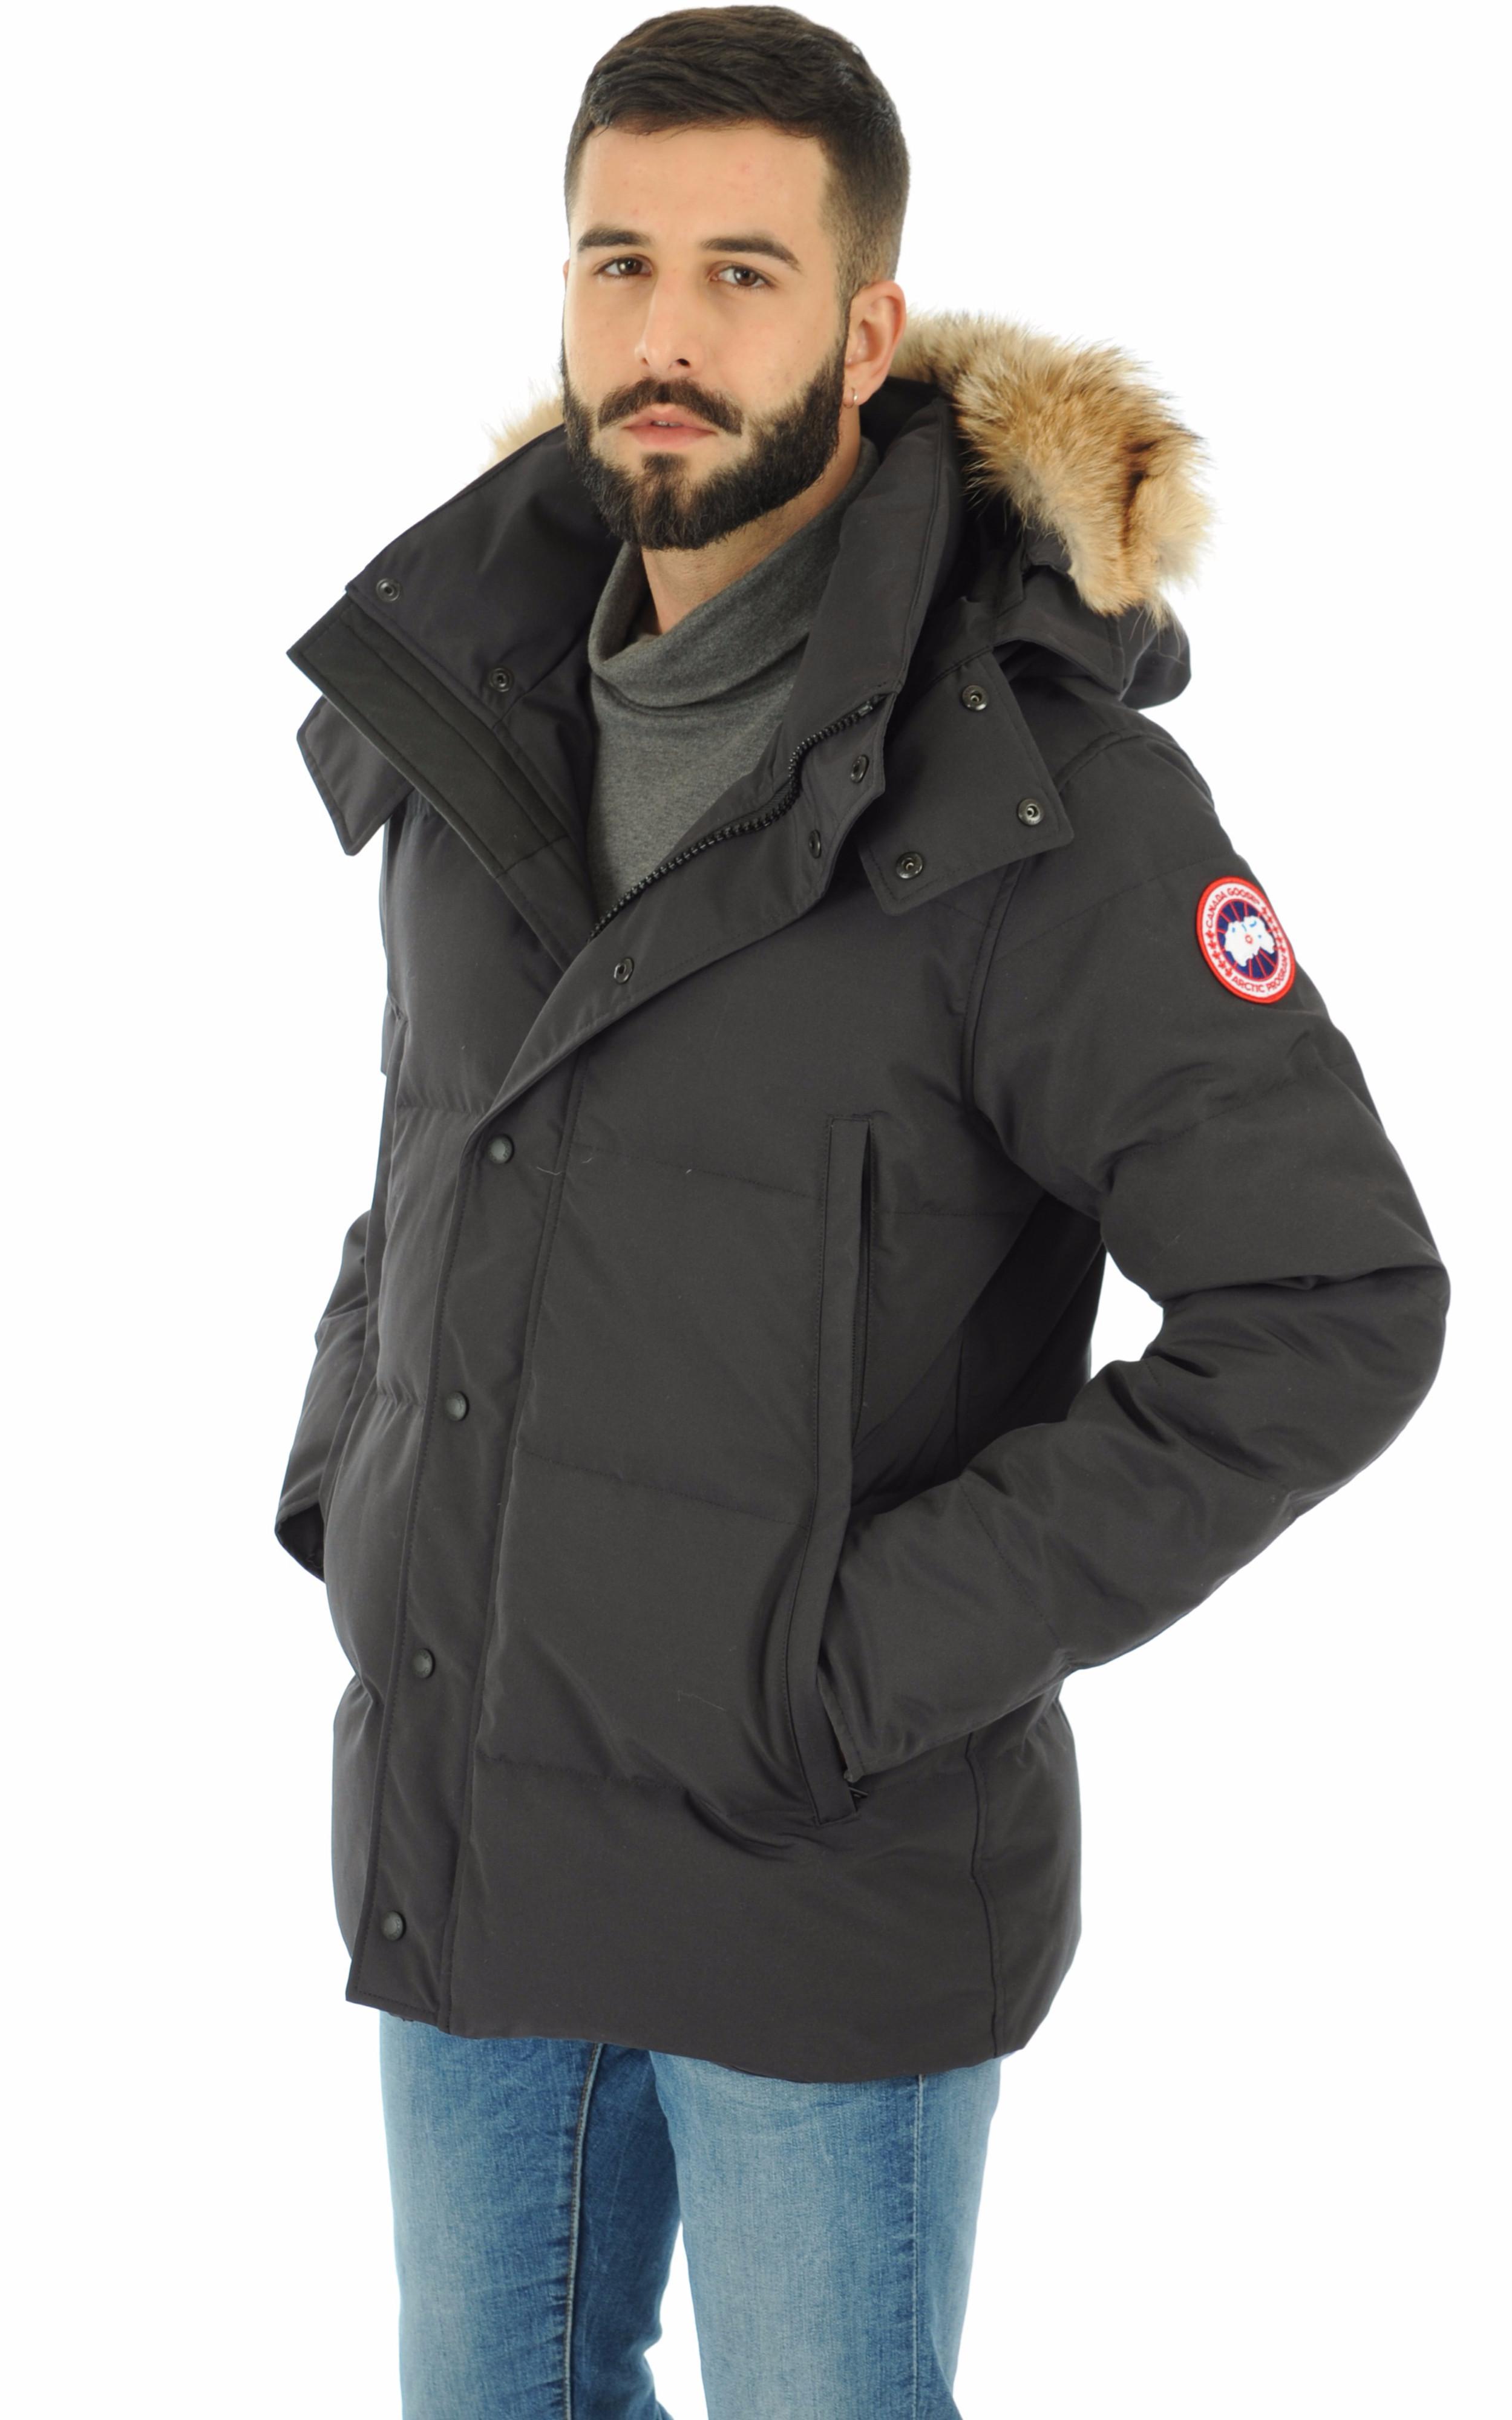 Parka Wyndham navy Canada Goose